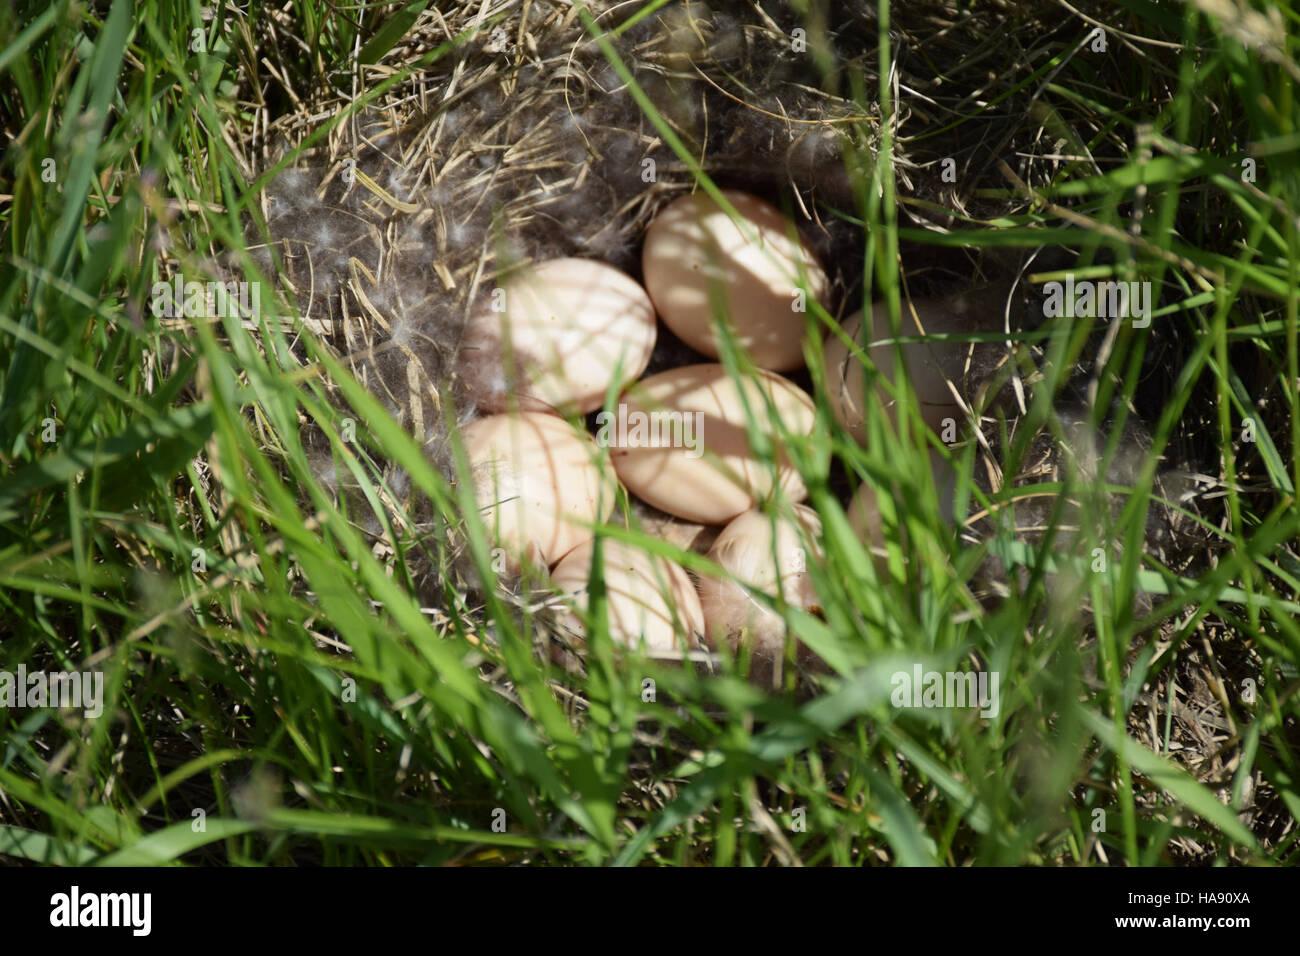 usfwsmtnprairie 28447564814 Blue-winged teal nest at J. Clark Salyer NWR - Stock Image